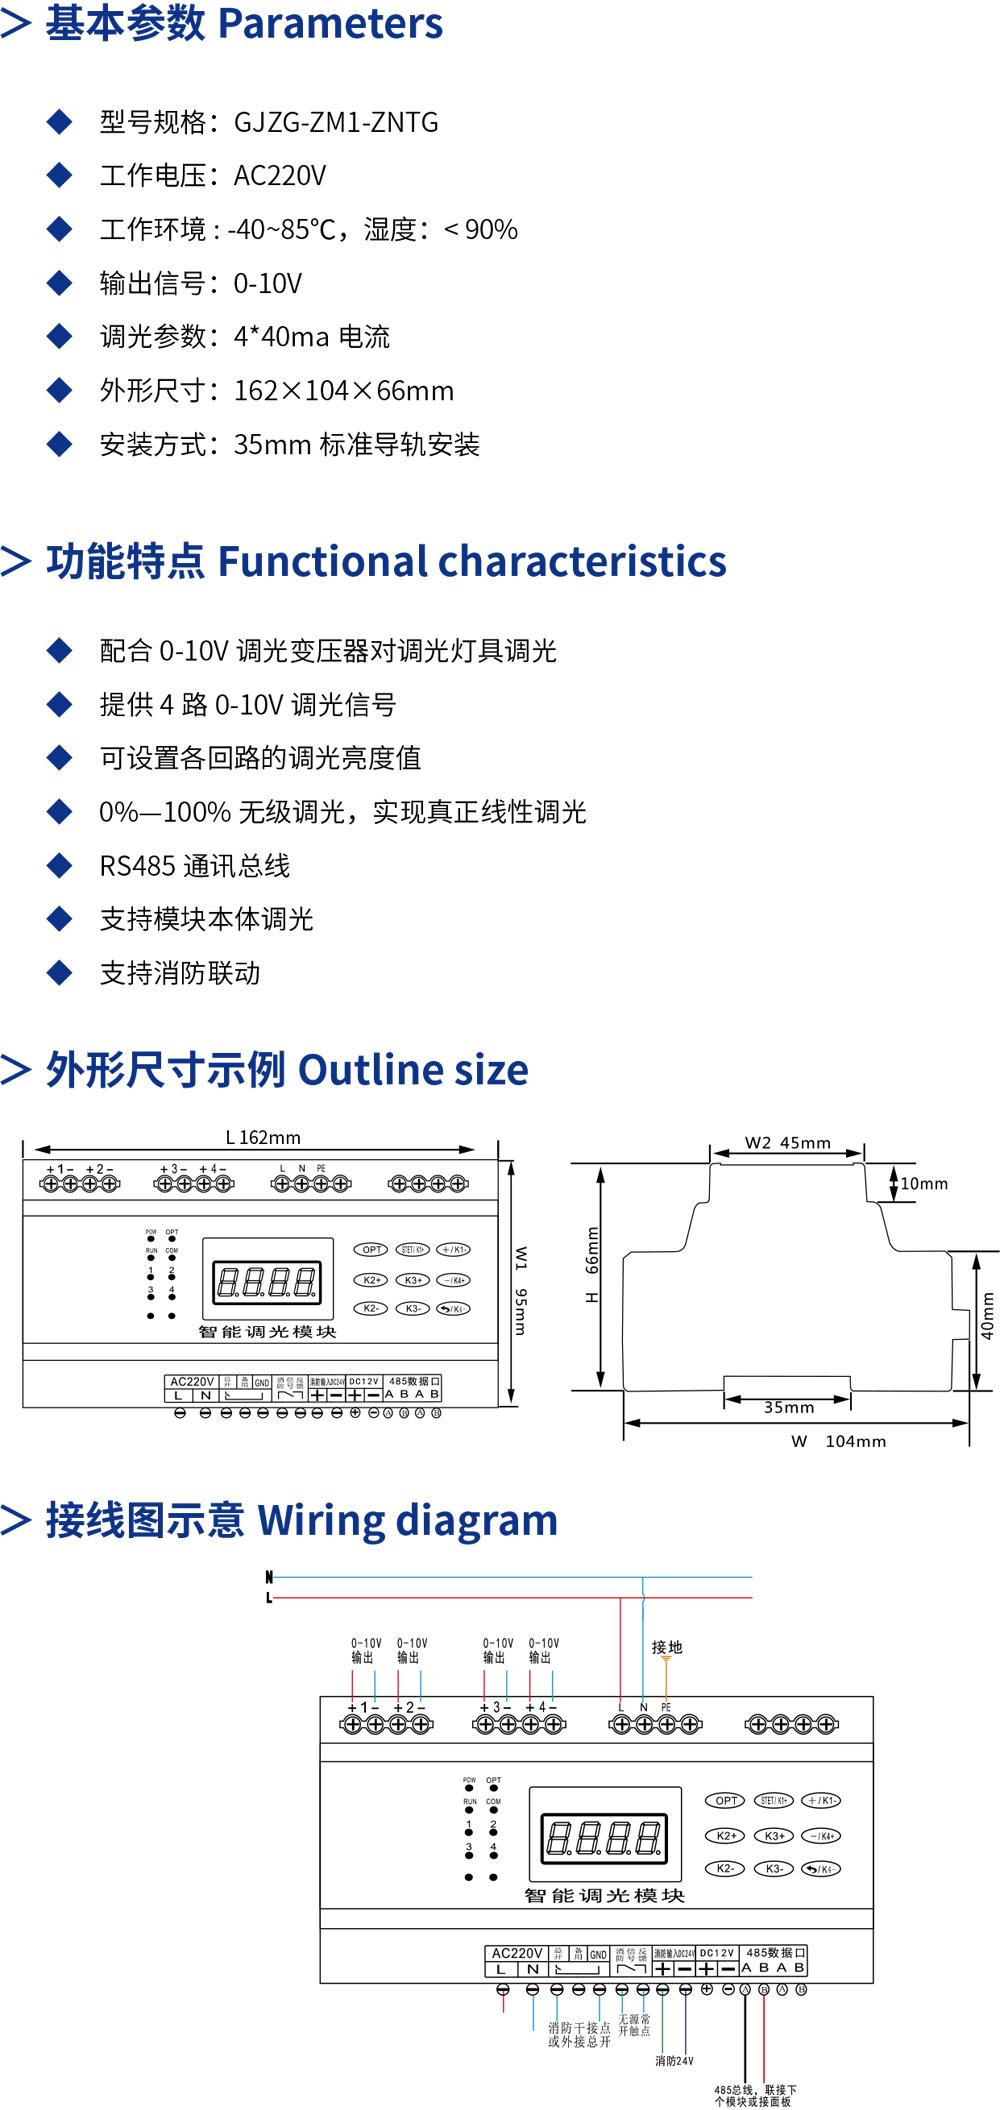 GJZG-ZM1-ZNTG-智能調光模塊詳情.jpg